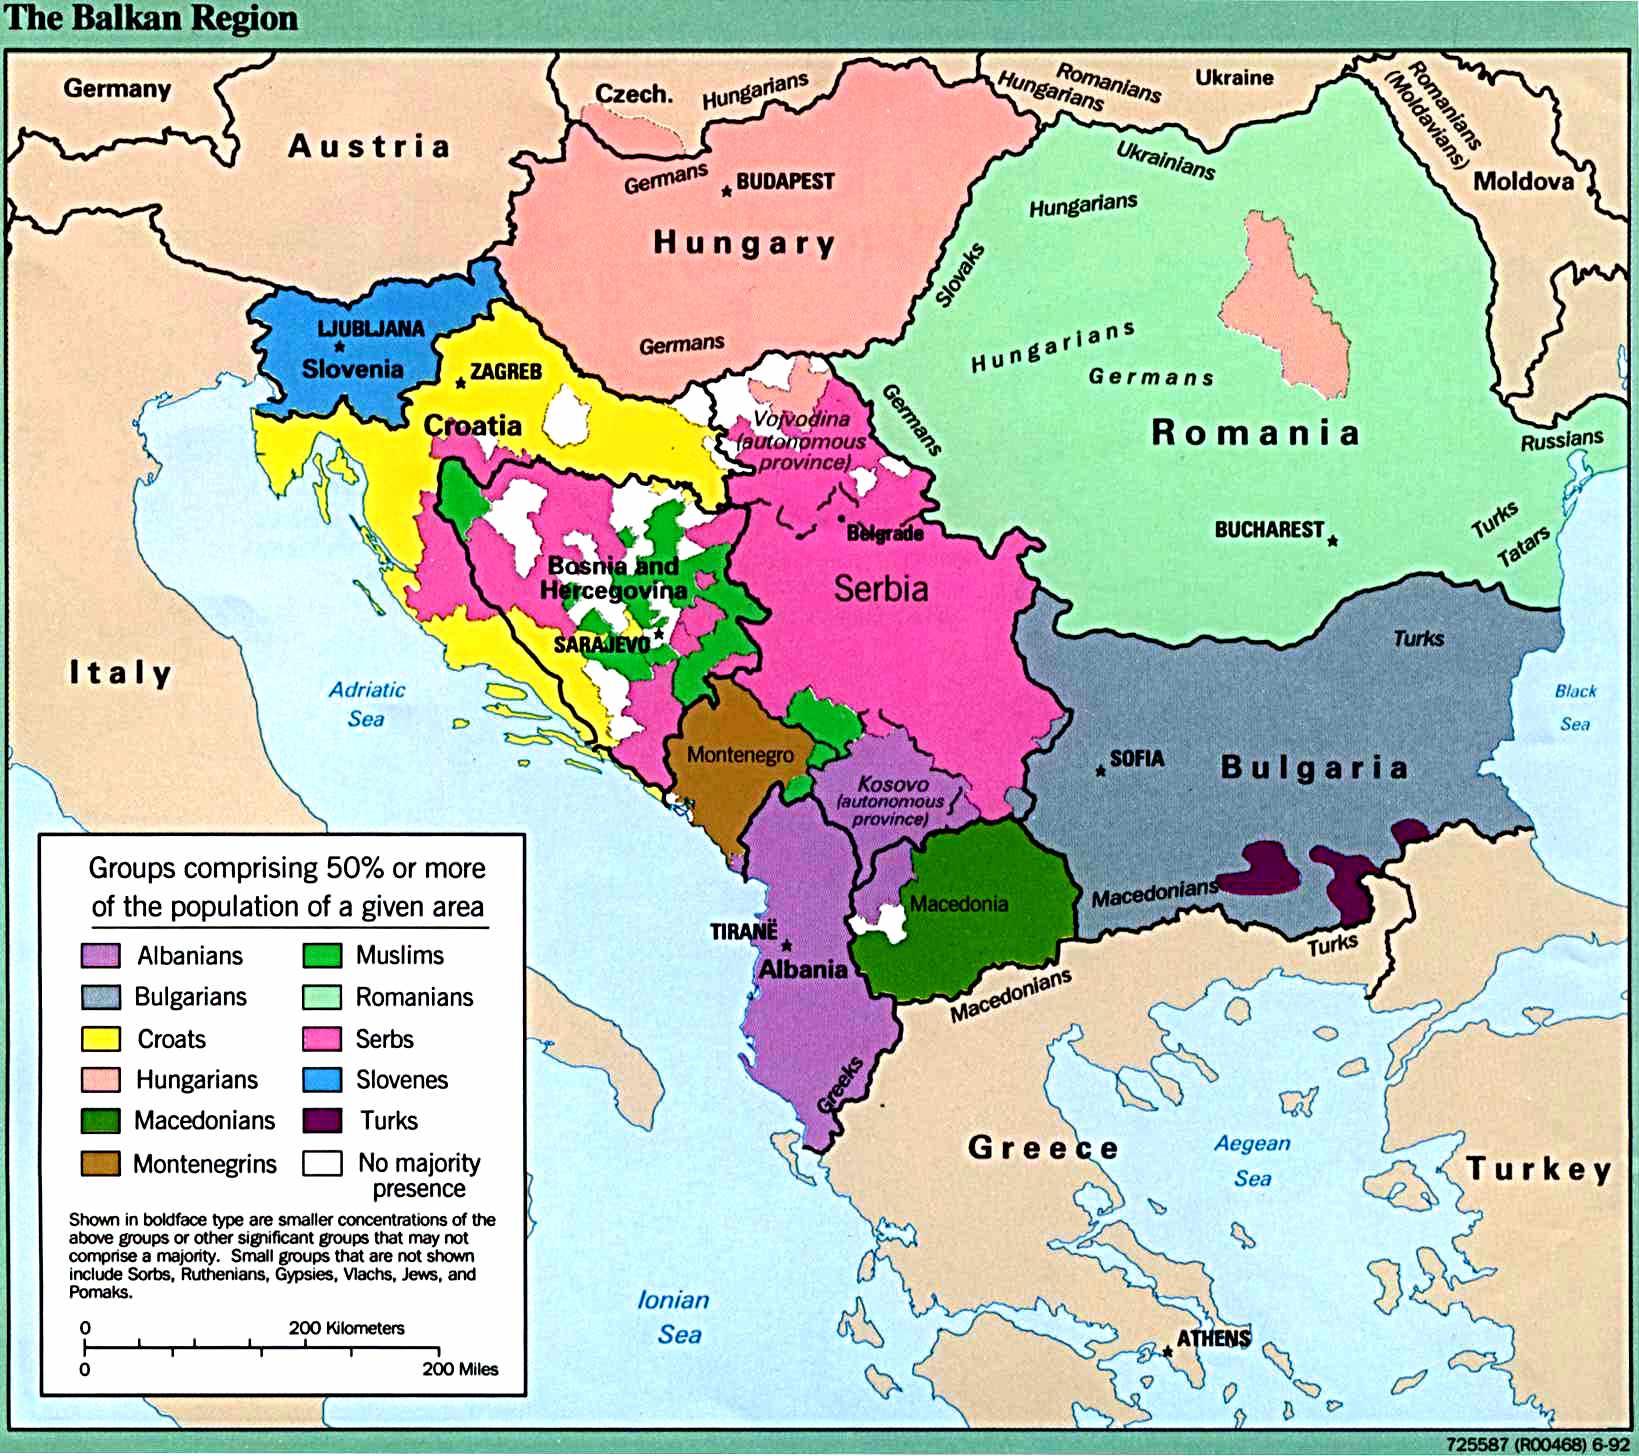 https://www.lib.utexas.edu/maps/europe/balkans.jpg